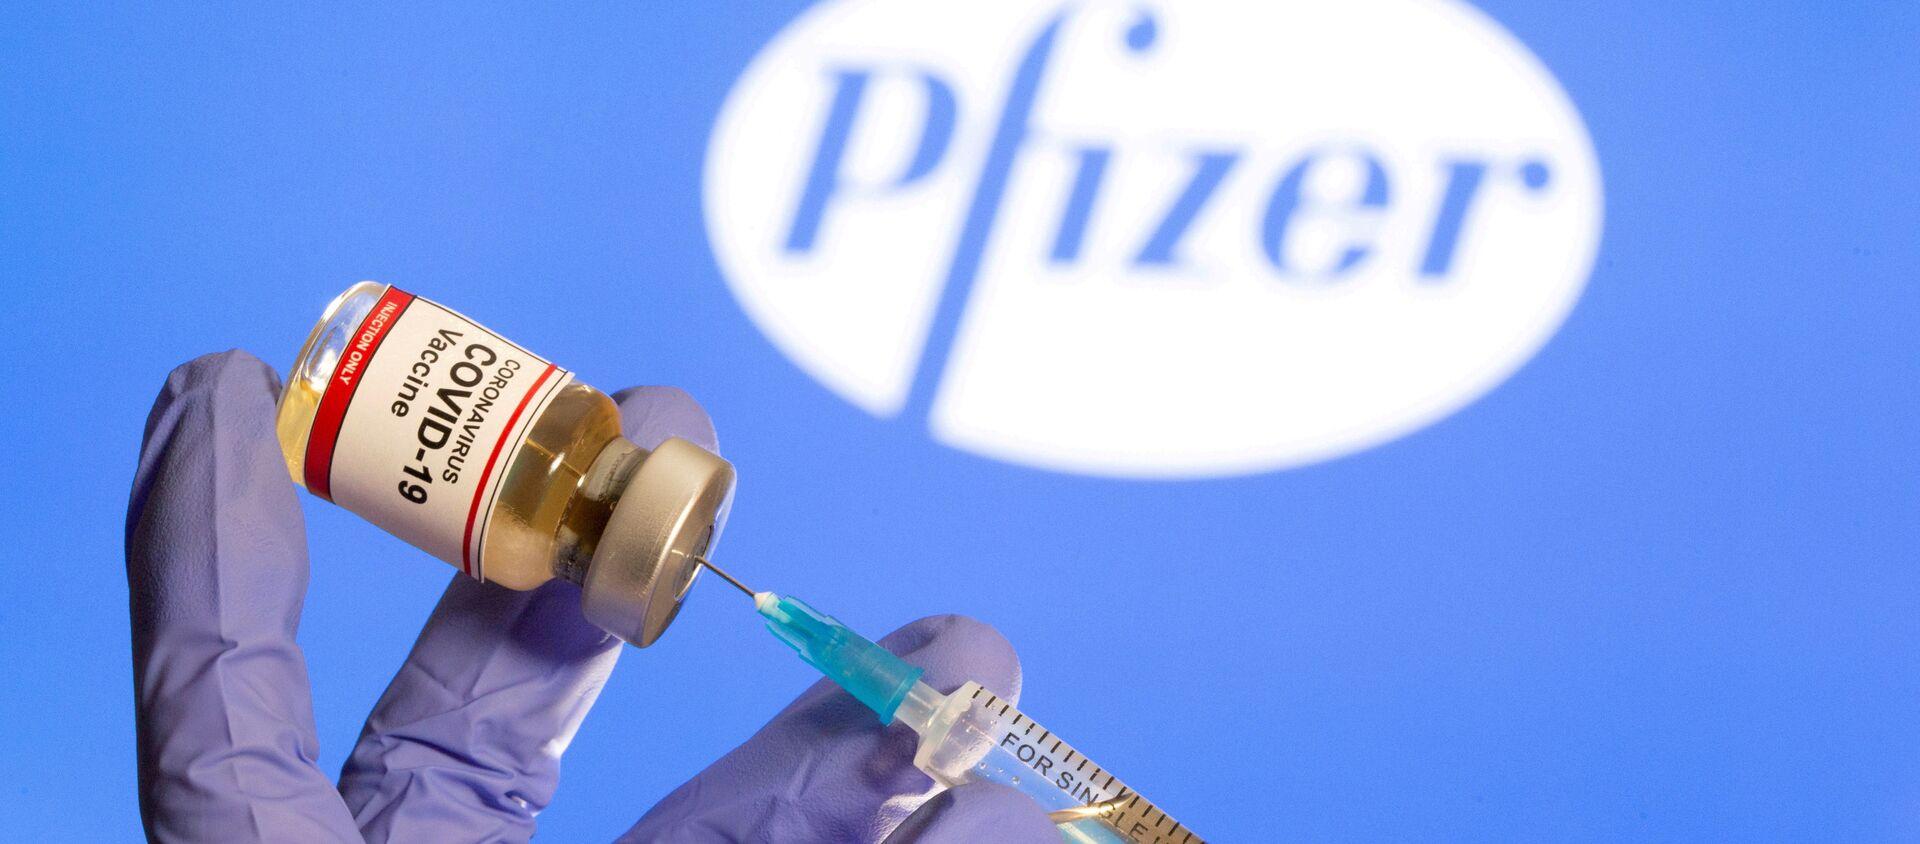 Vacuna contra el coronavirus Pfizer - Sputnik Mundo, 1920, 15.01.2021